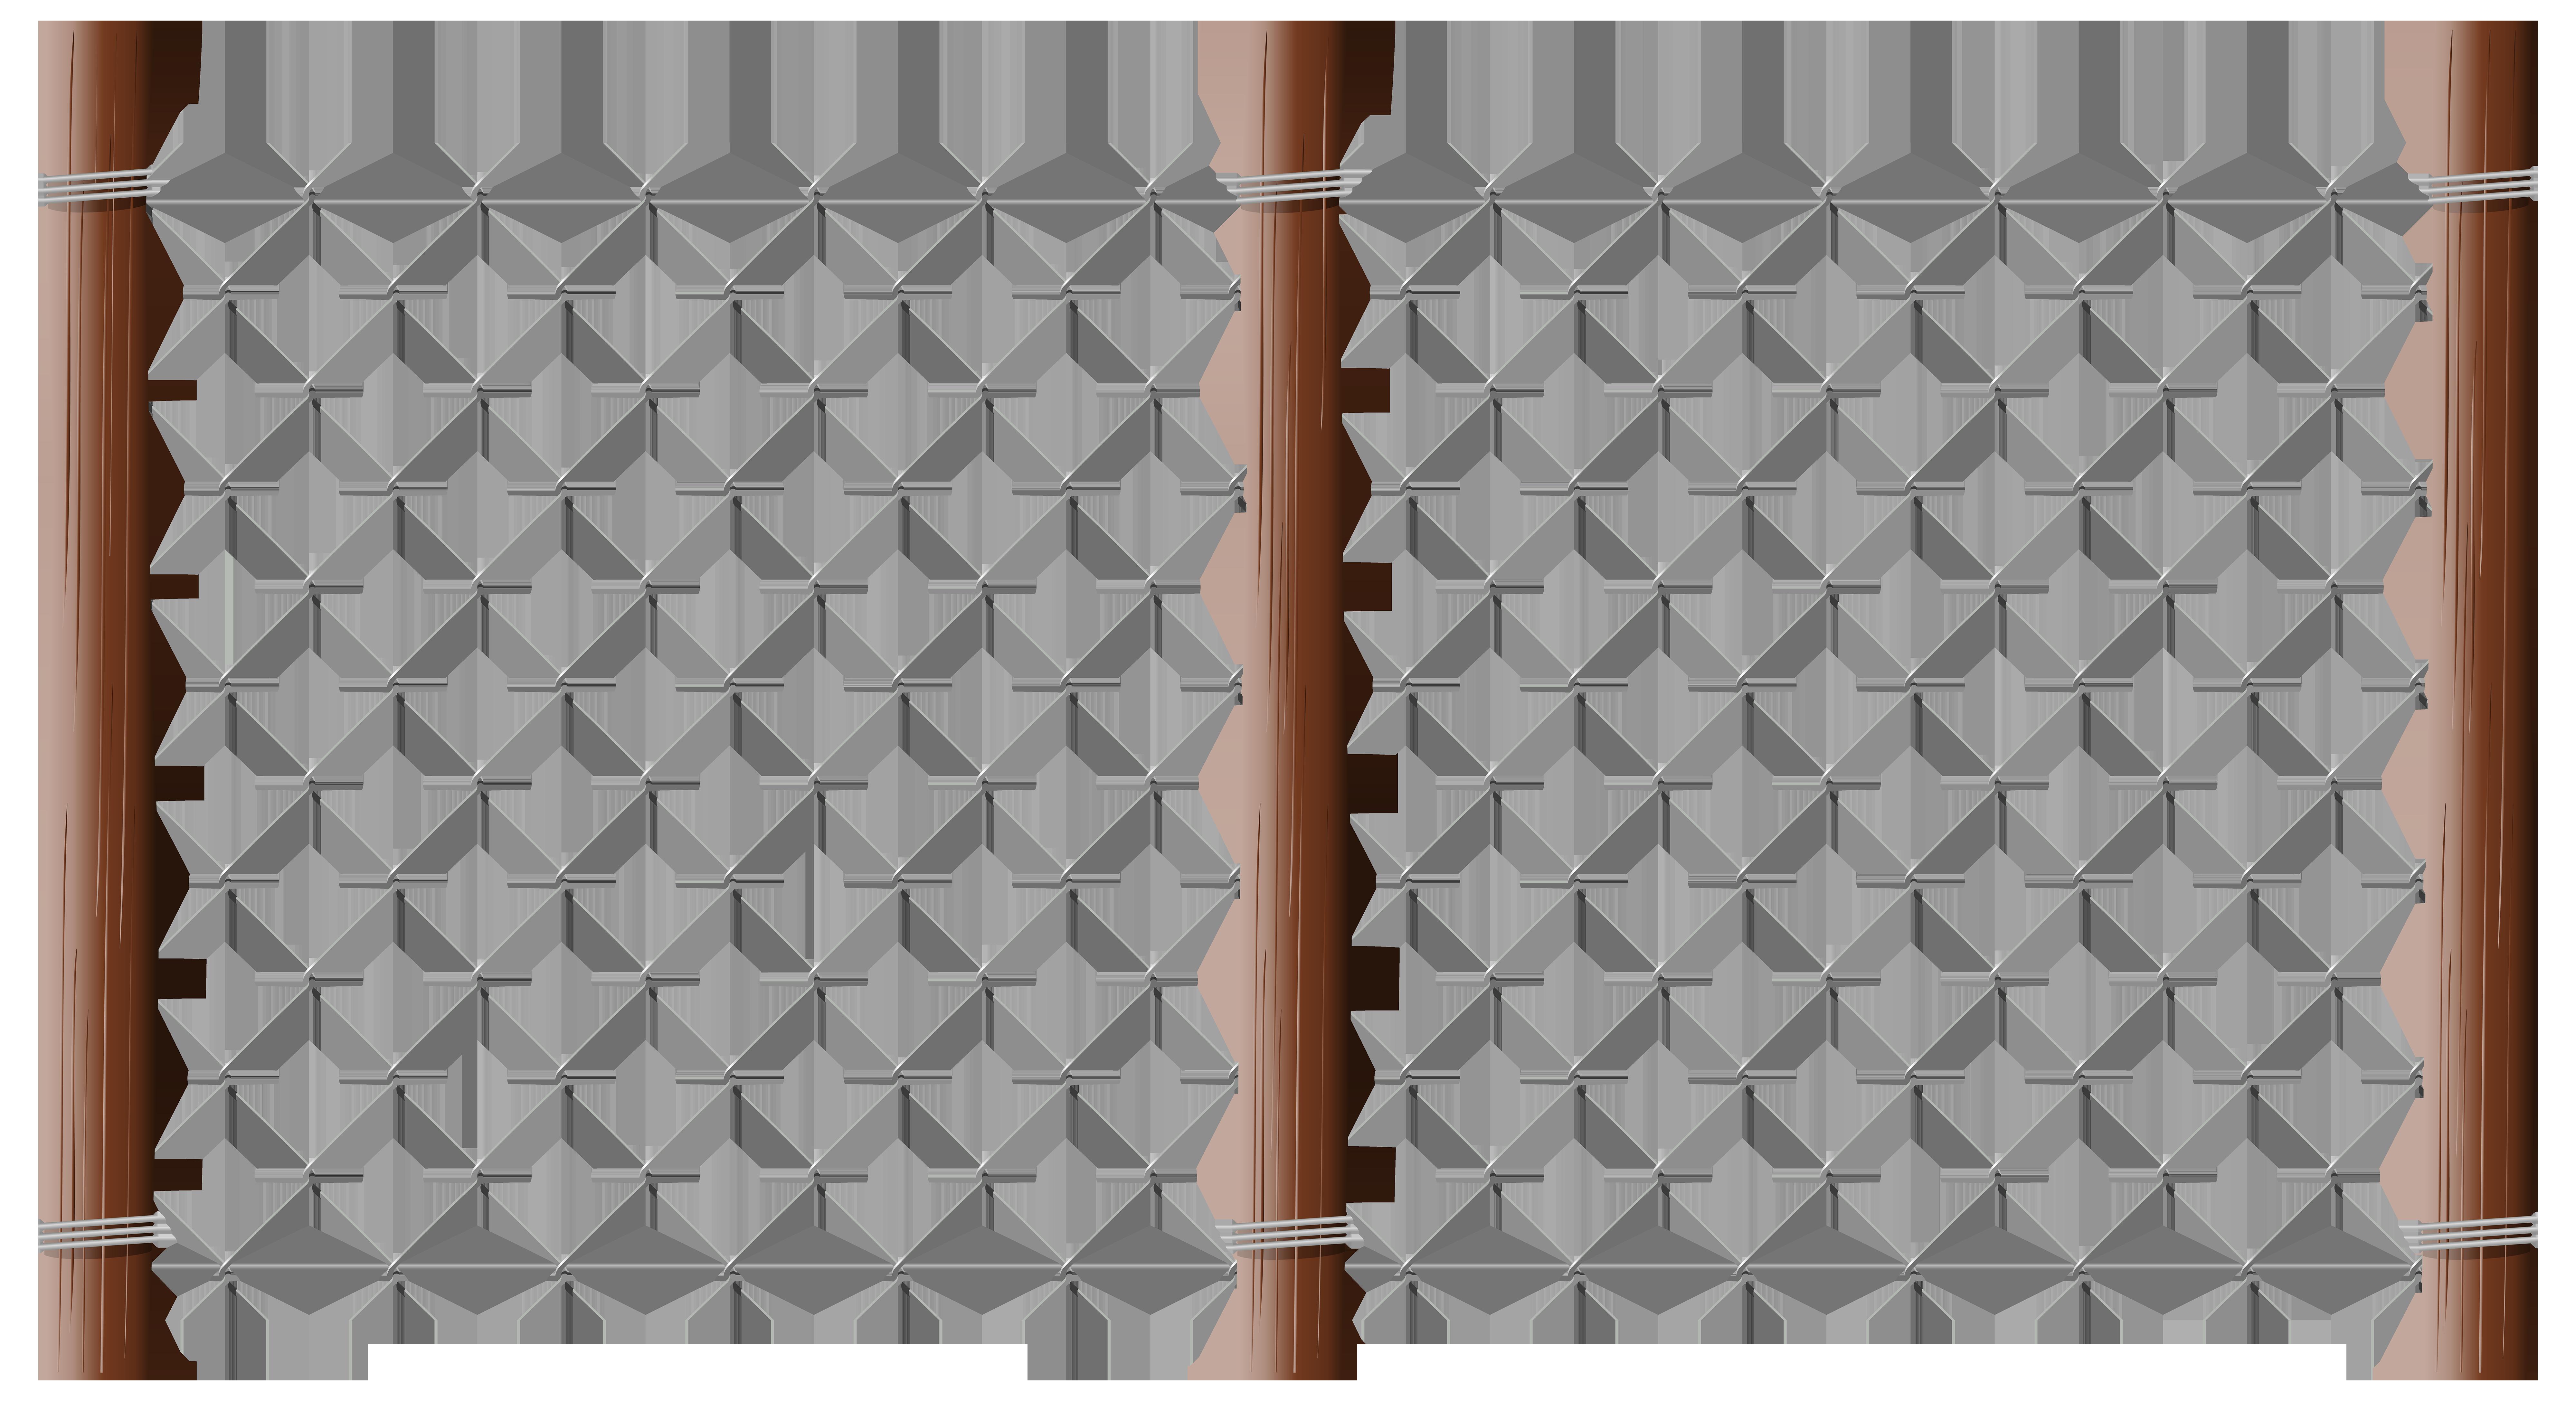 Fence PNG Transparent Clip Art Image.